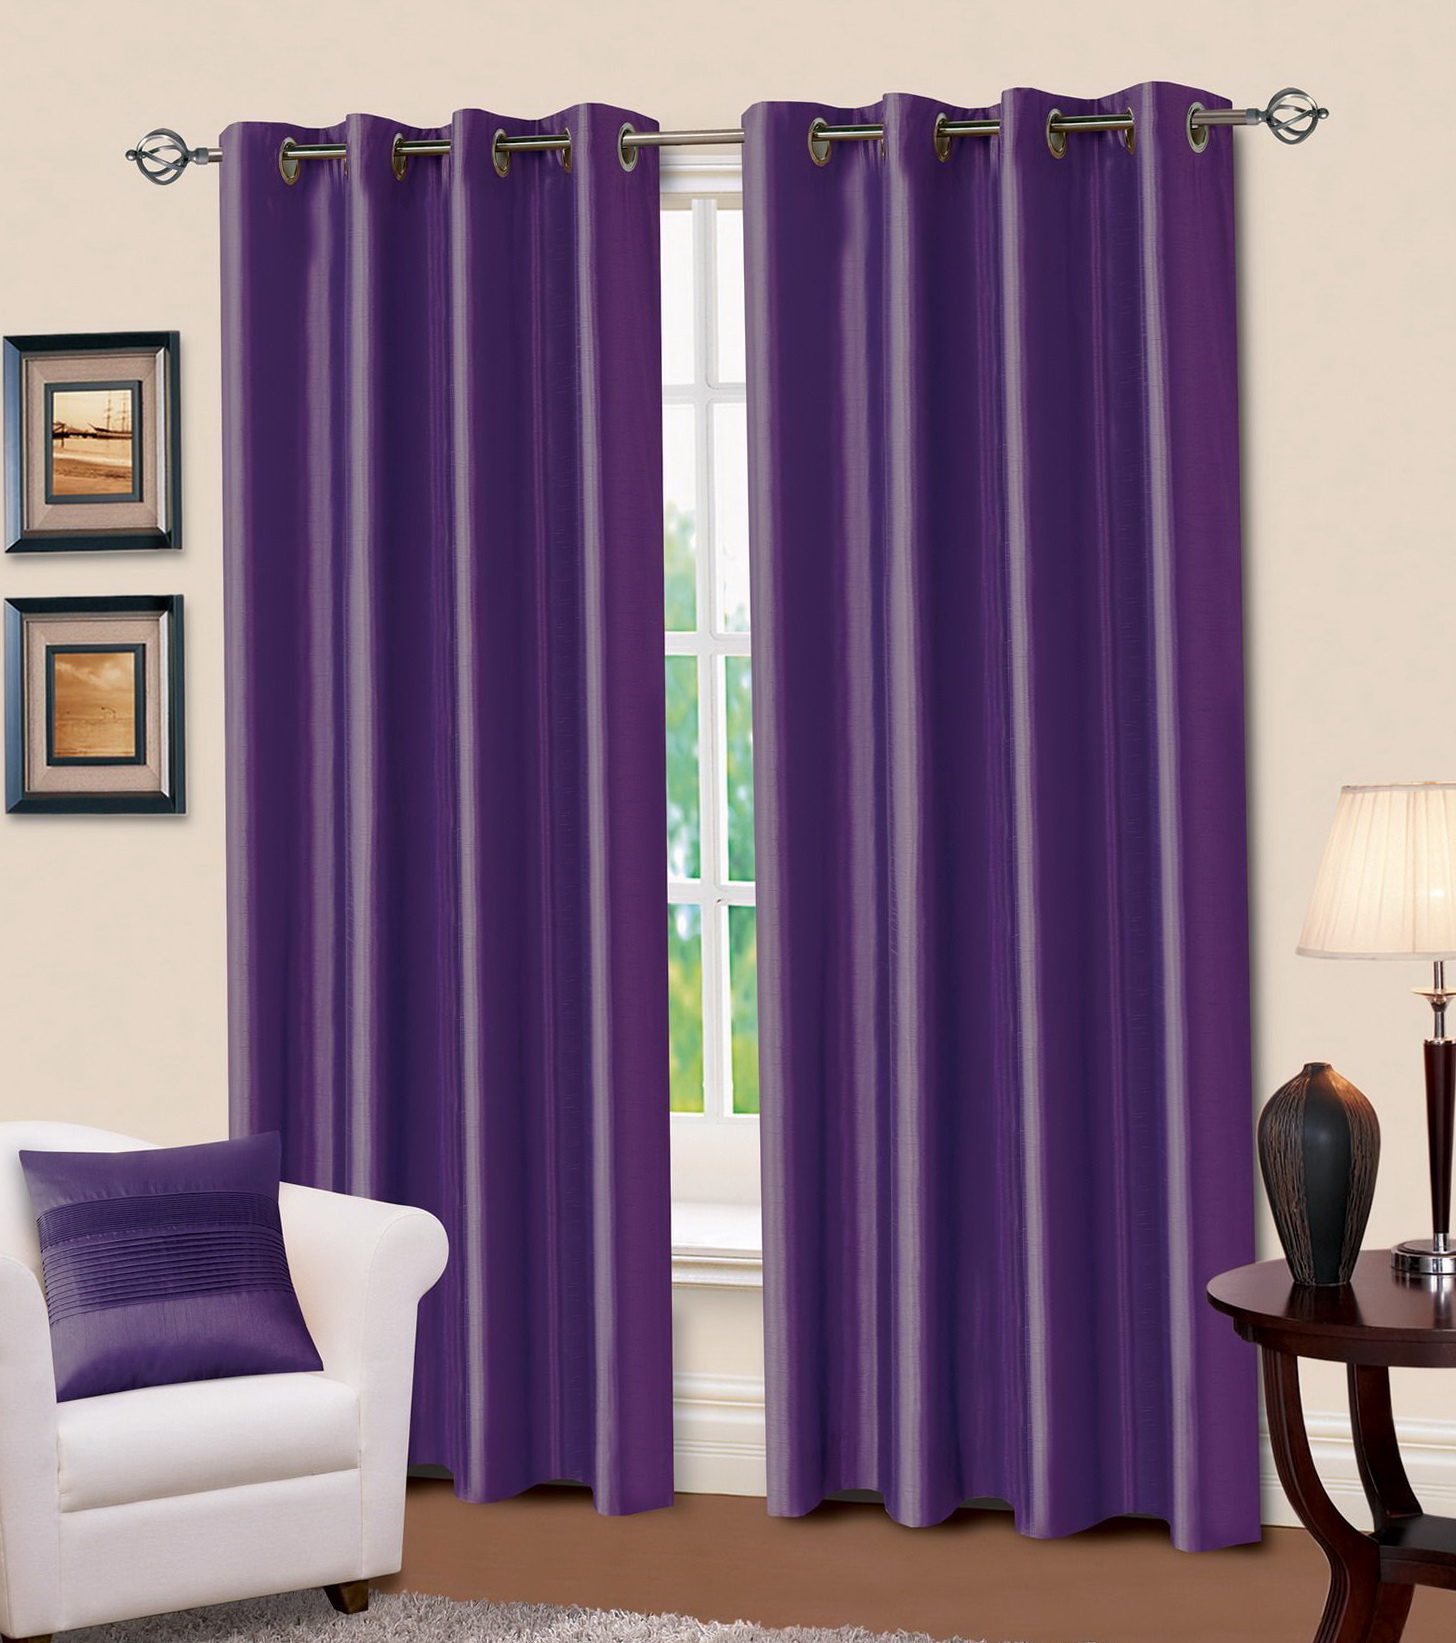 Faux Suede Curtains 90 X 90 Home Design Ideas